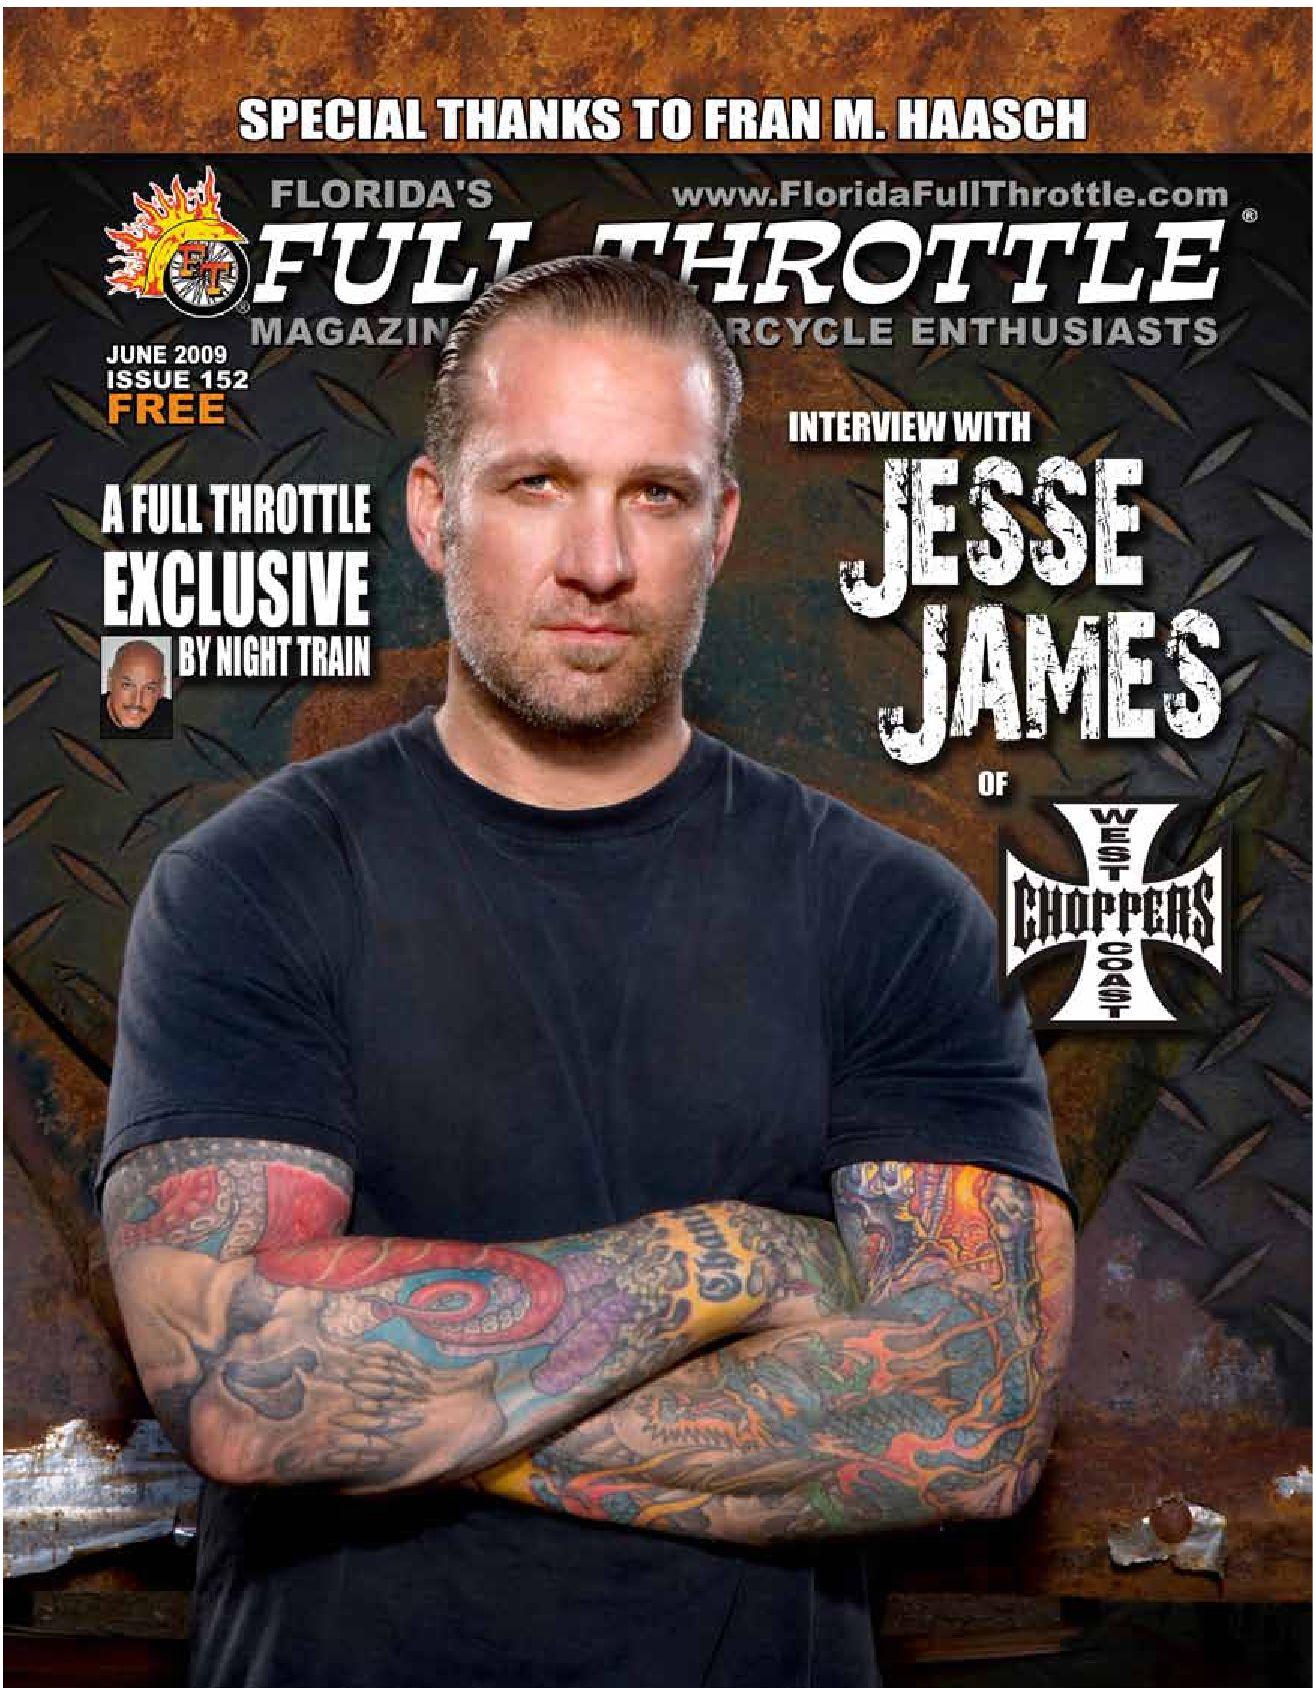 f02f47bd4e45f Full Throttle June 09 by Florida Full Throttle Magazine - issuu